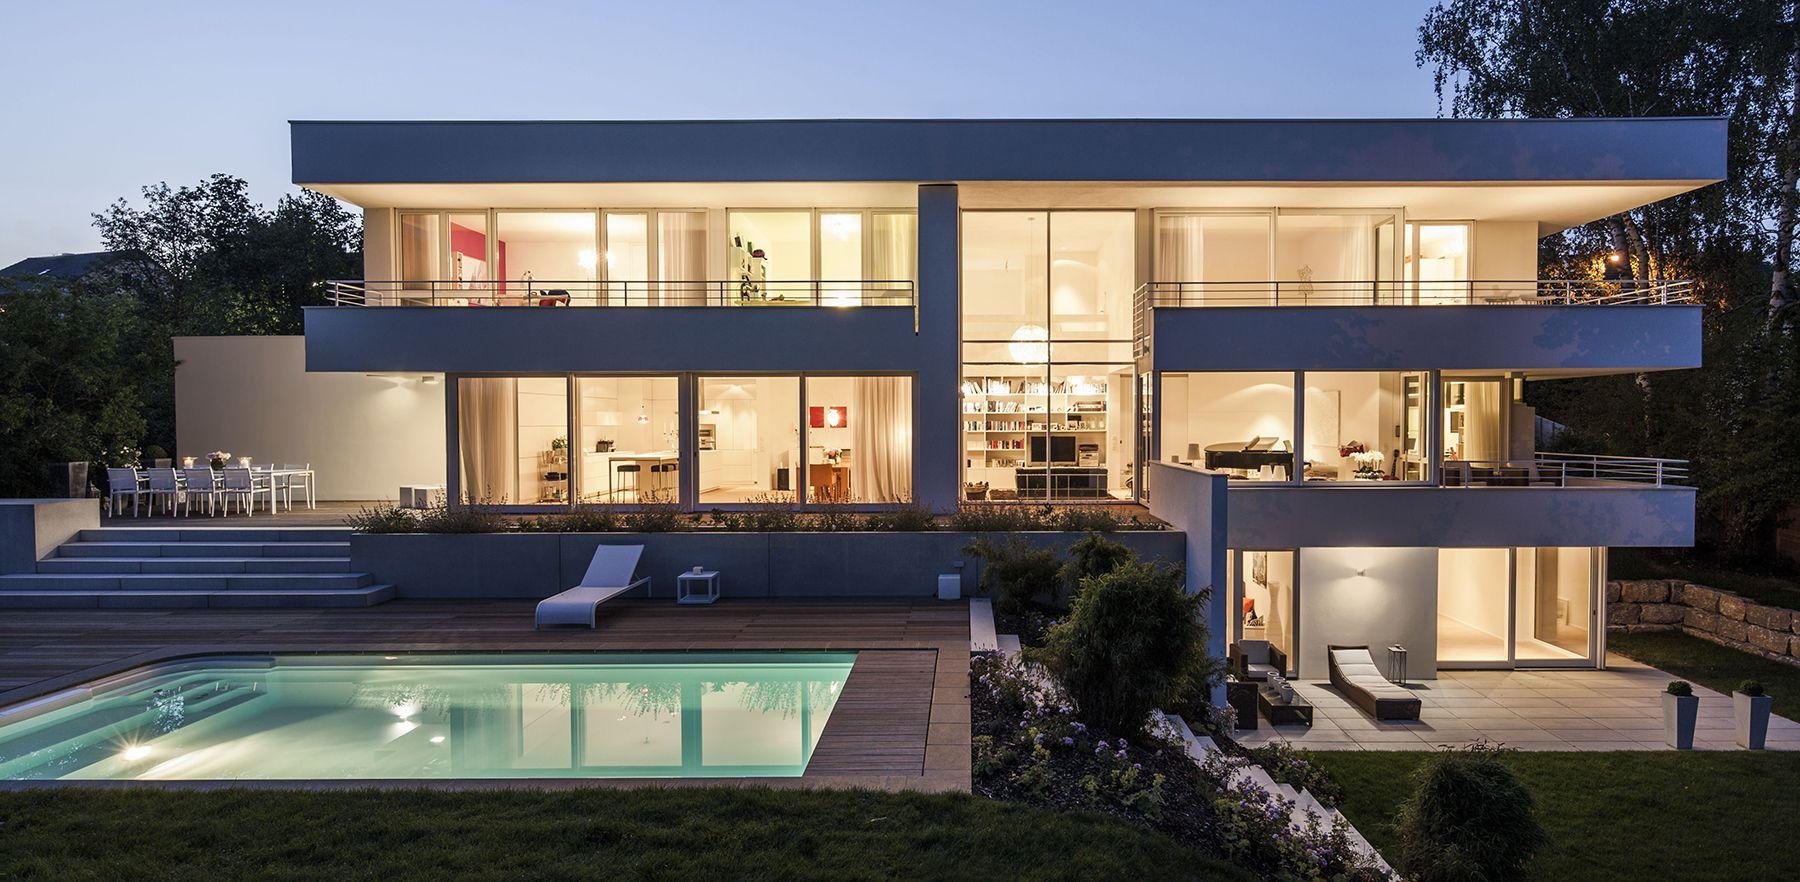 House jl architekten bda fuchs wacker archi pinterest